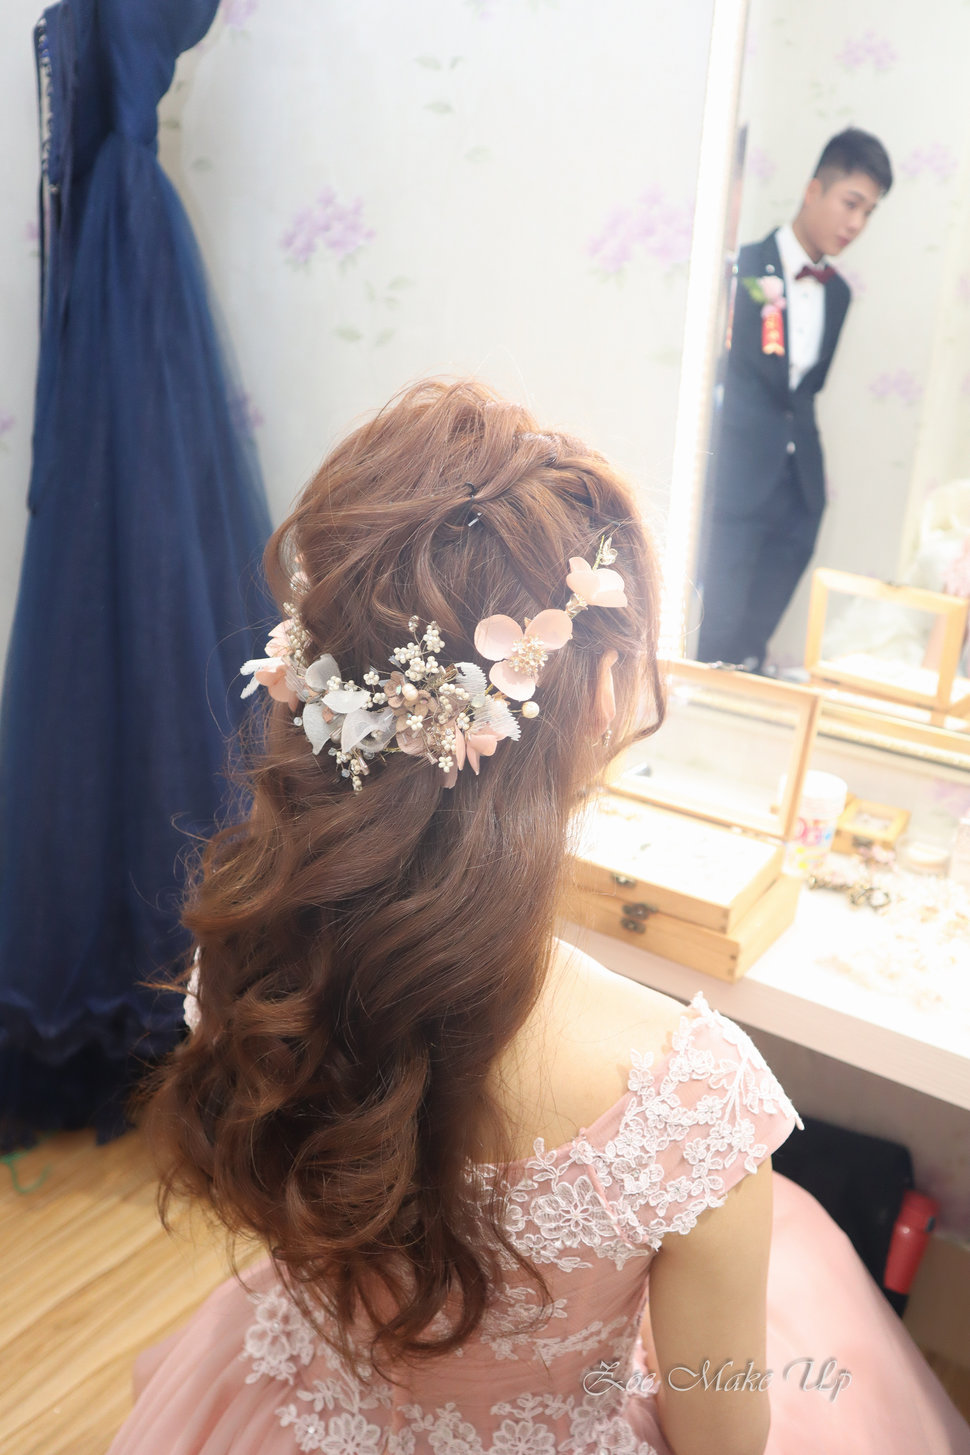 IMG_1258修 - Zoe 幸福時分 新娘秘書《結婚吧》